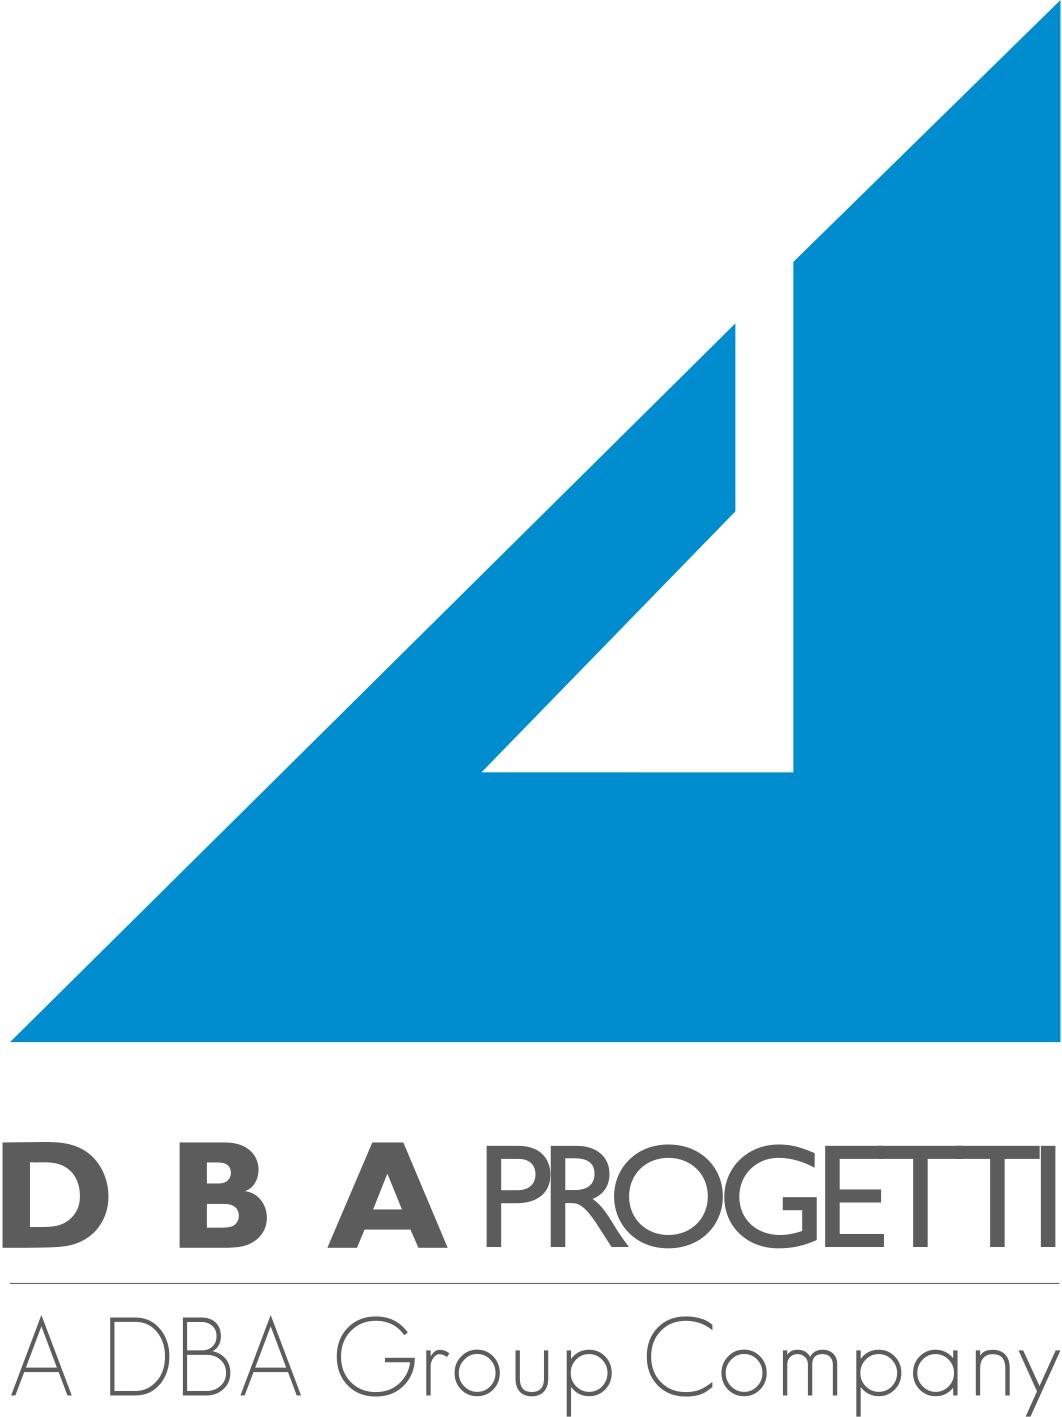 DBA_Prog_cmp_LOGO